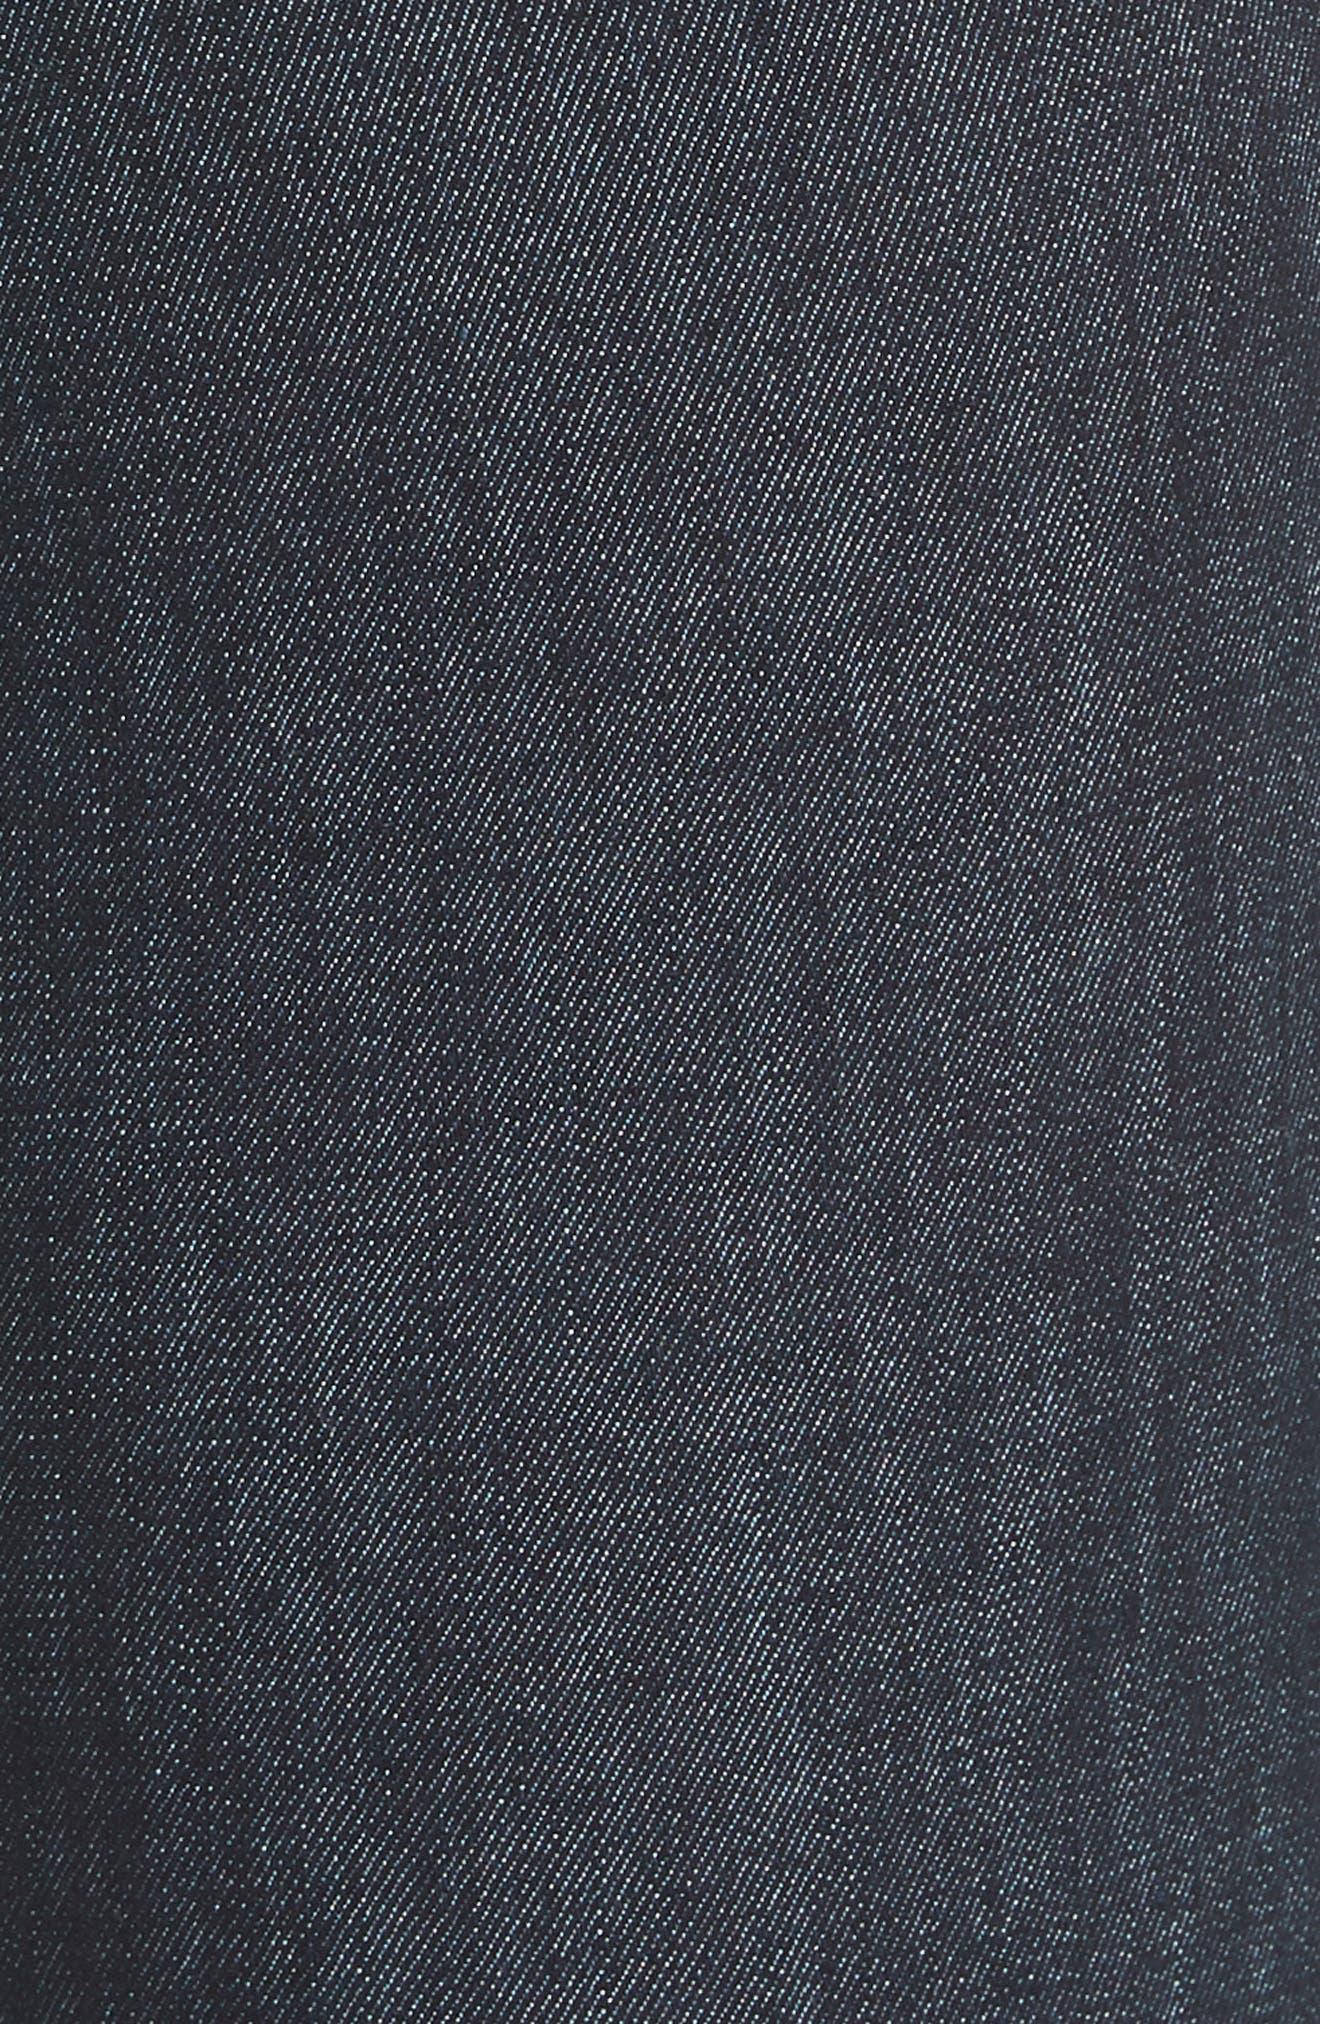 RAG & BONE, High Waist Skinny Jeans, Alternate thumbnail 6, color, INDIGO